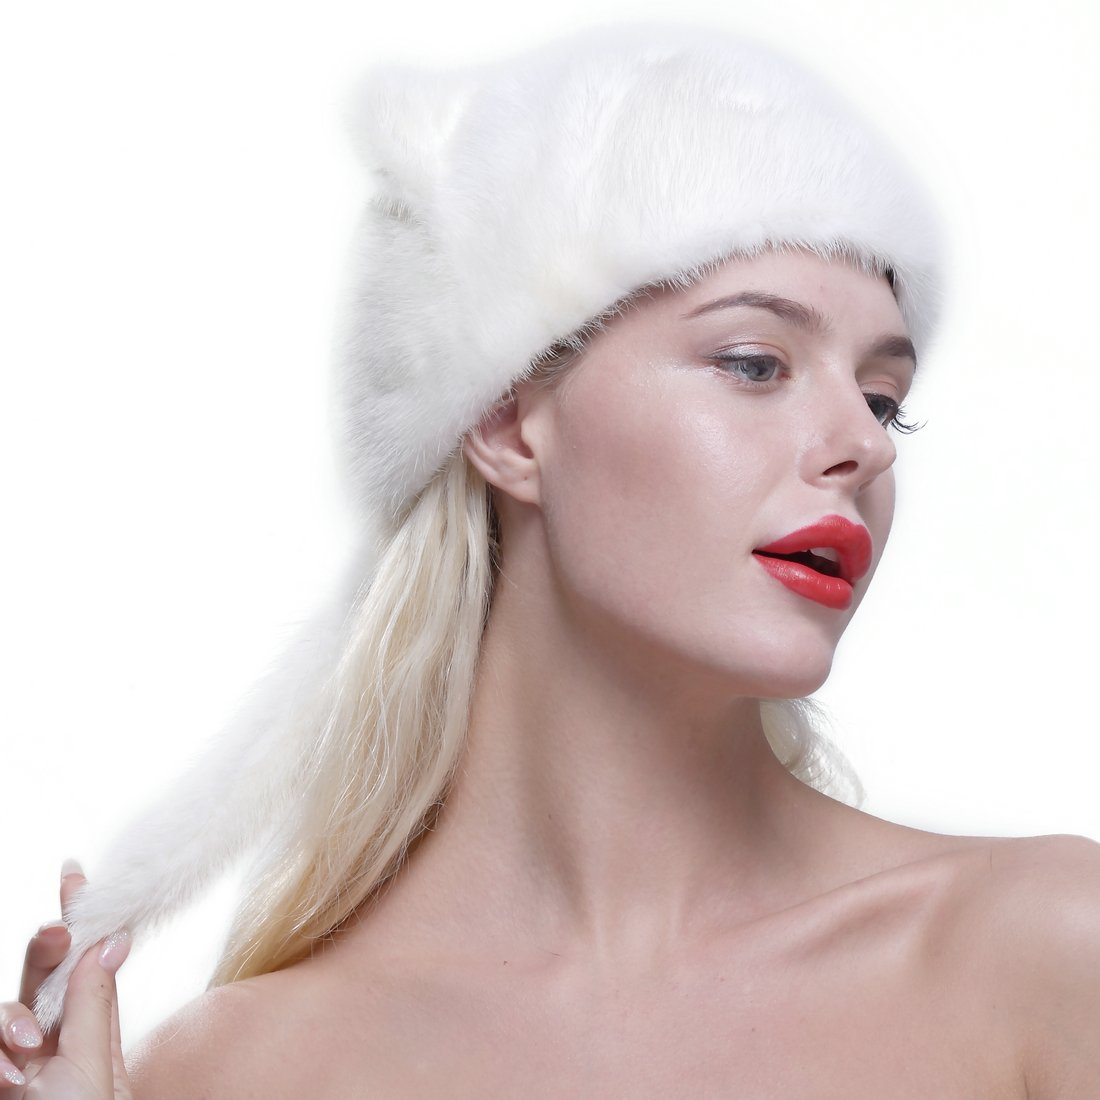 URSFUR Women's Winter Cat Ears Hat Real Mink Fur Baseball Cap with Fur Tail